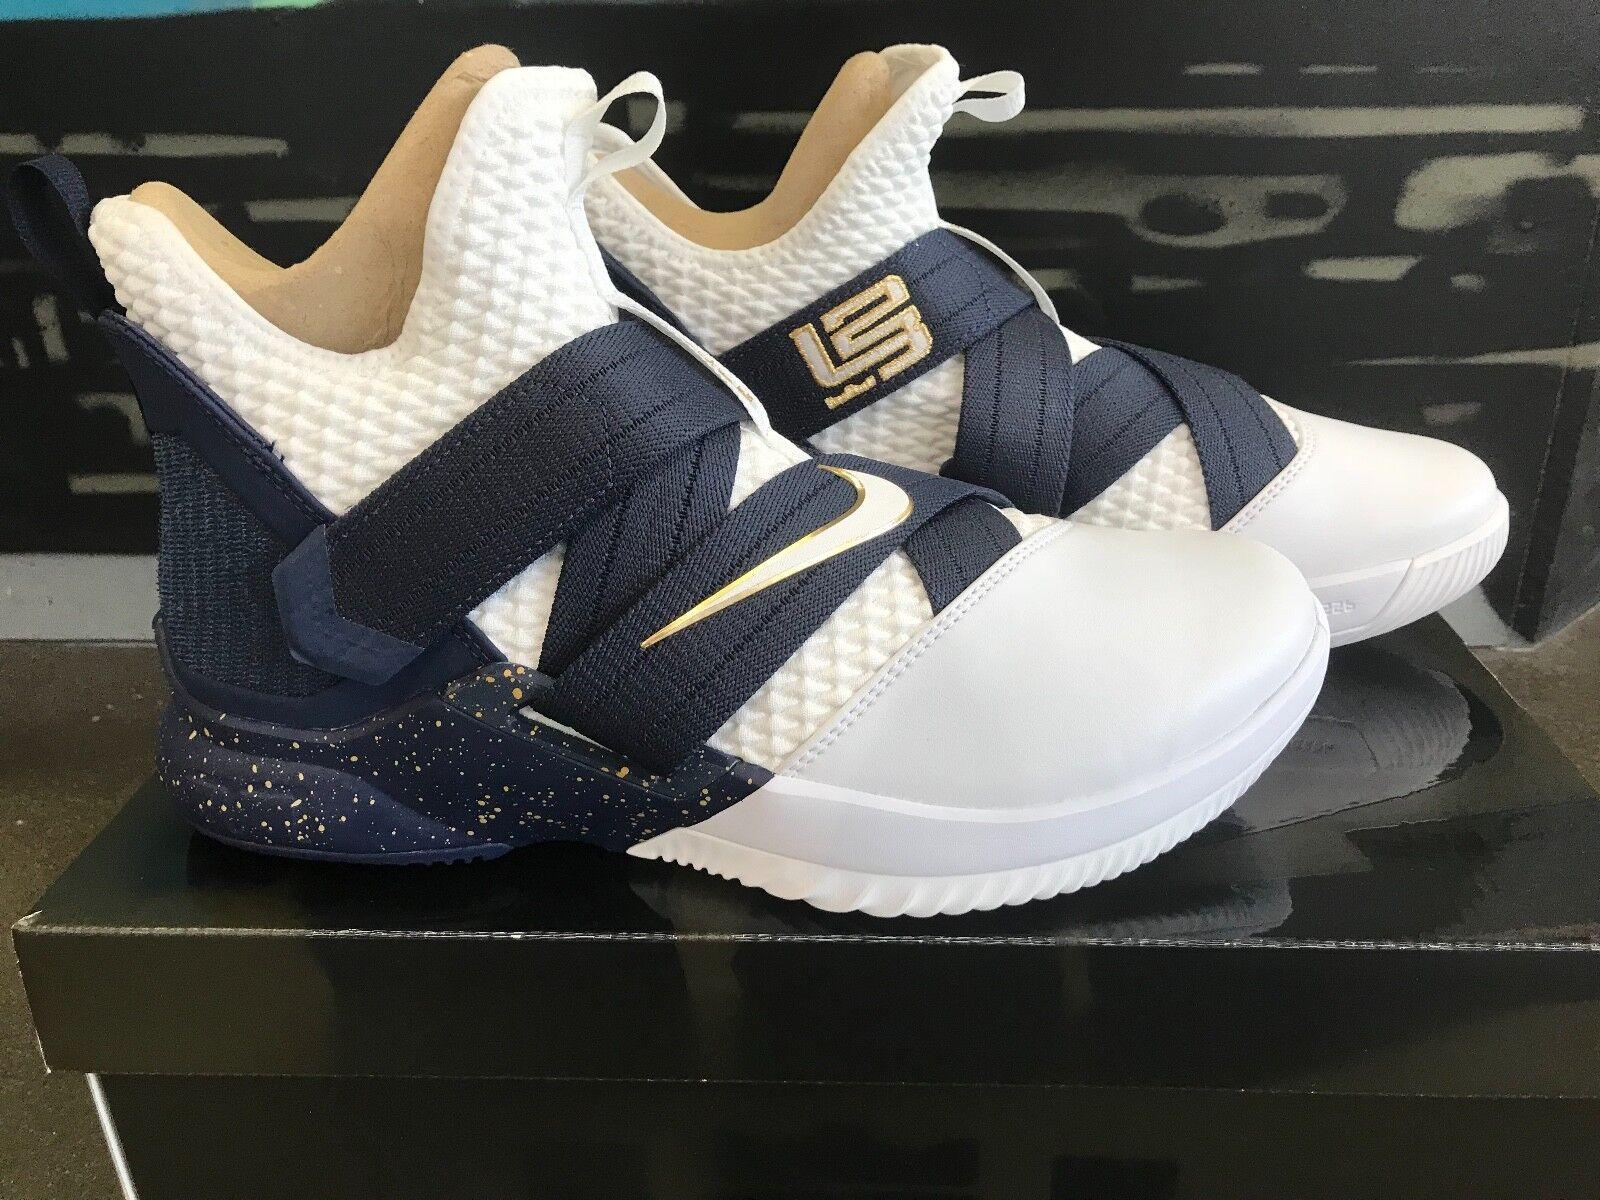 Nike lebron soldat xii sfg zeugen ao4054-100 lebron schuhe james basketball - schuhe lebron nib 7cecee